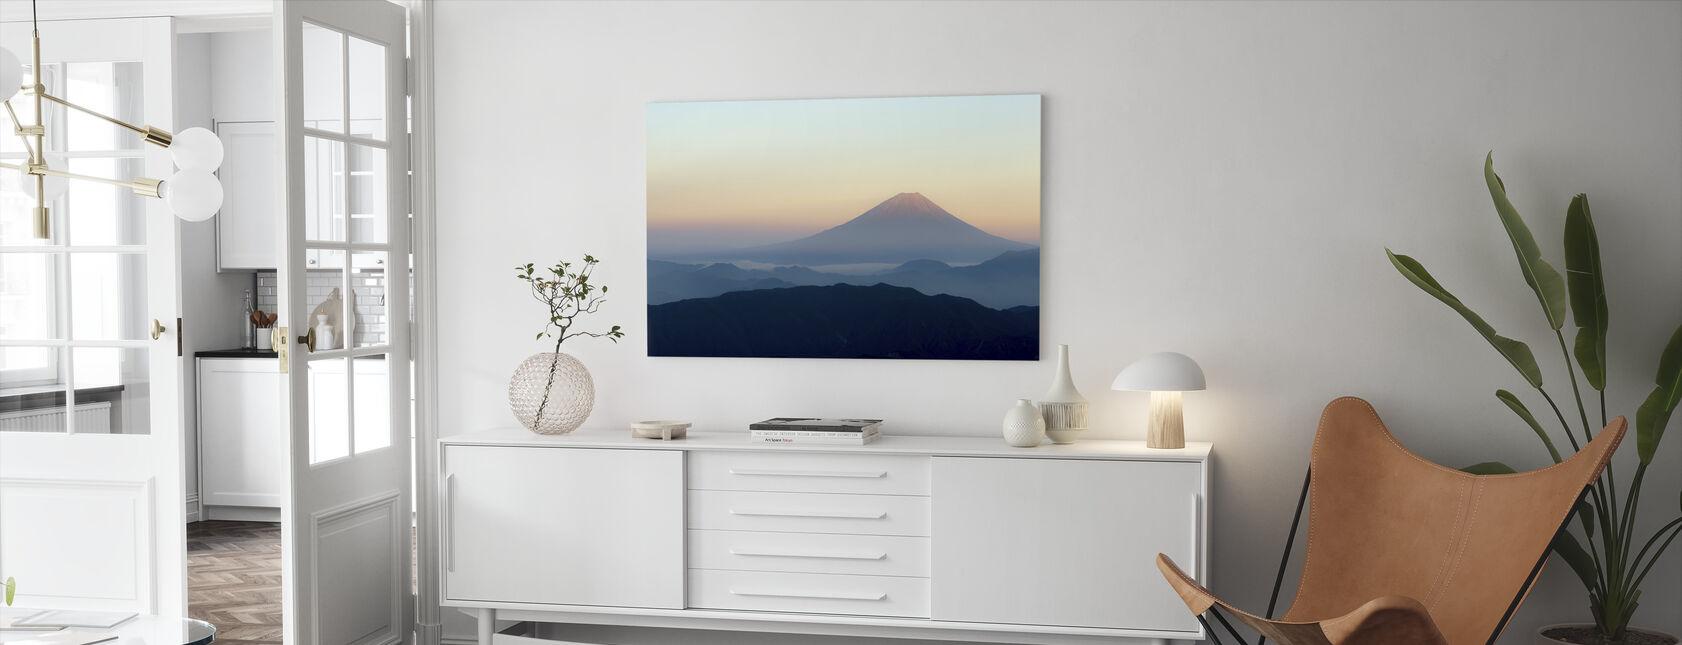 Mt. Fuji - Canvastaulu - Olohuone